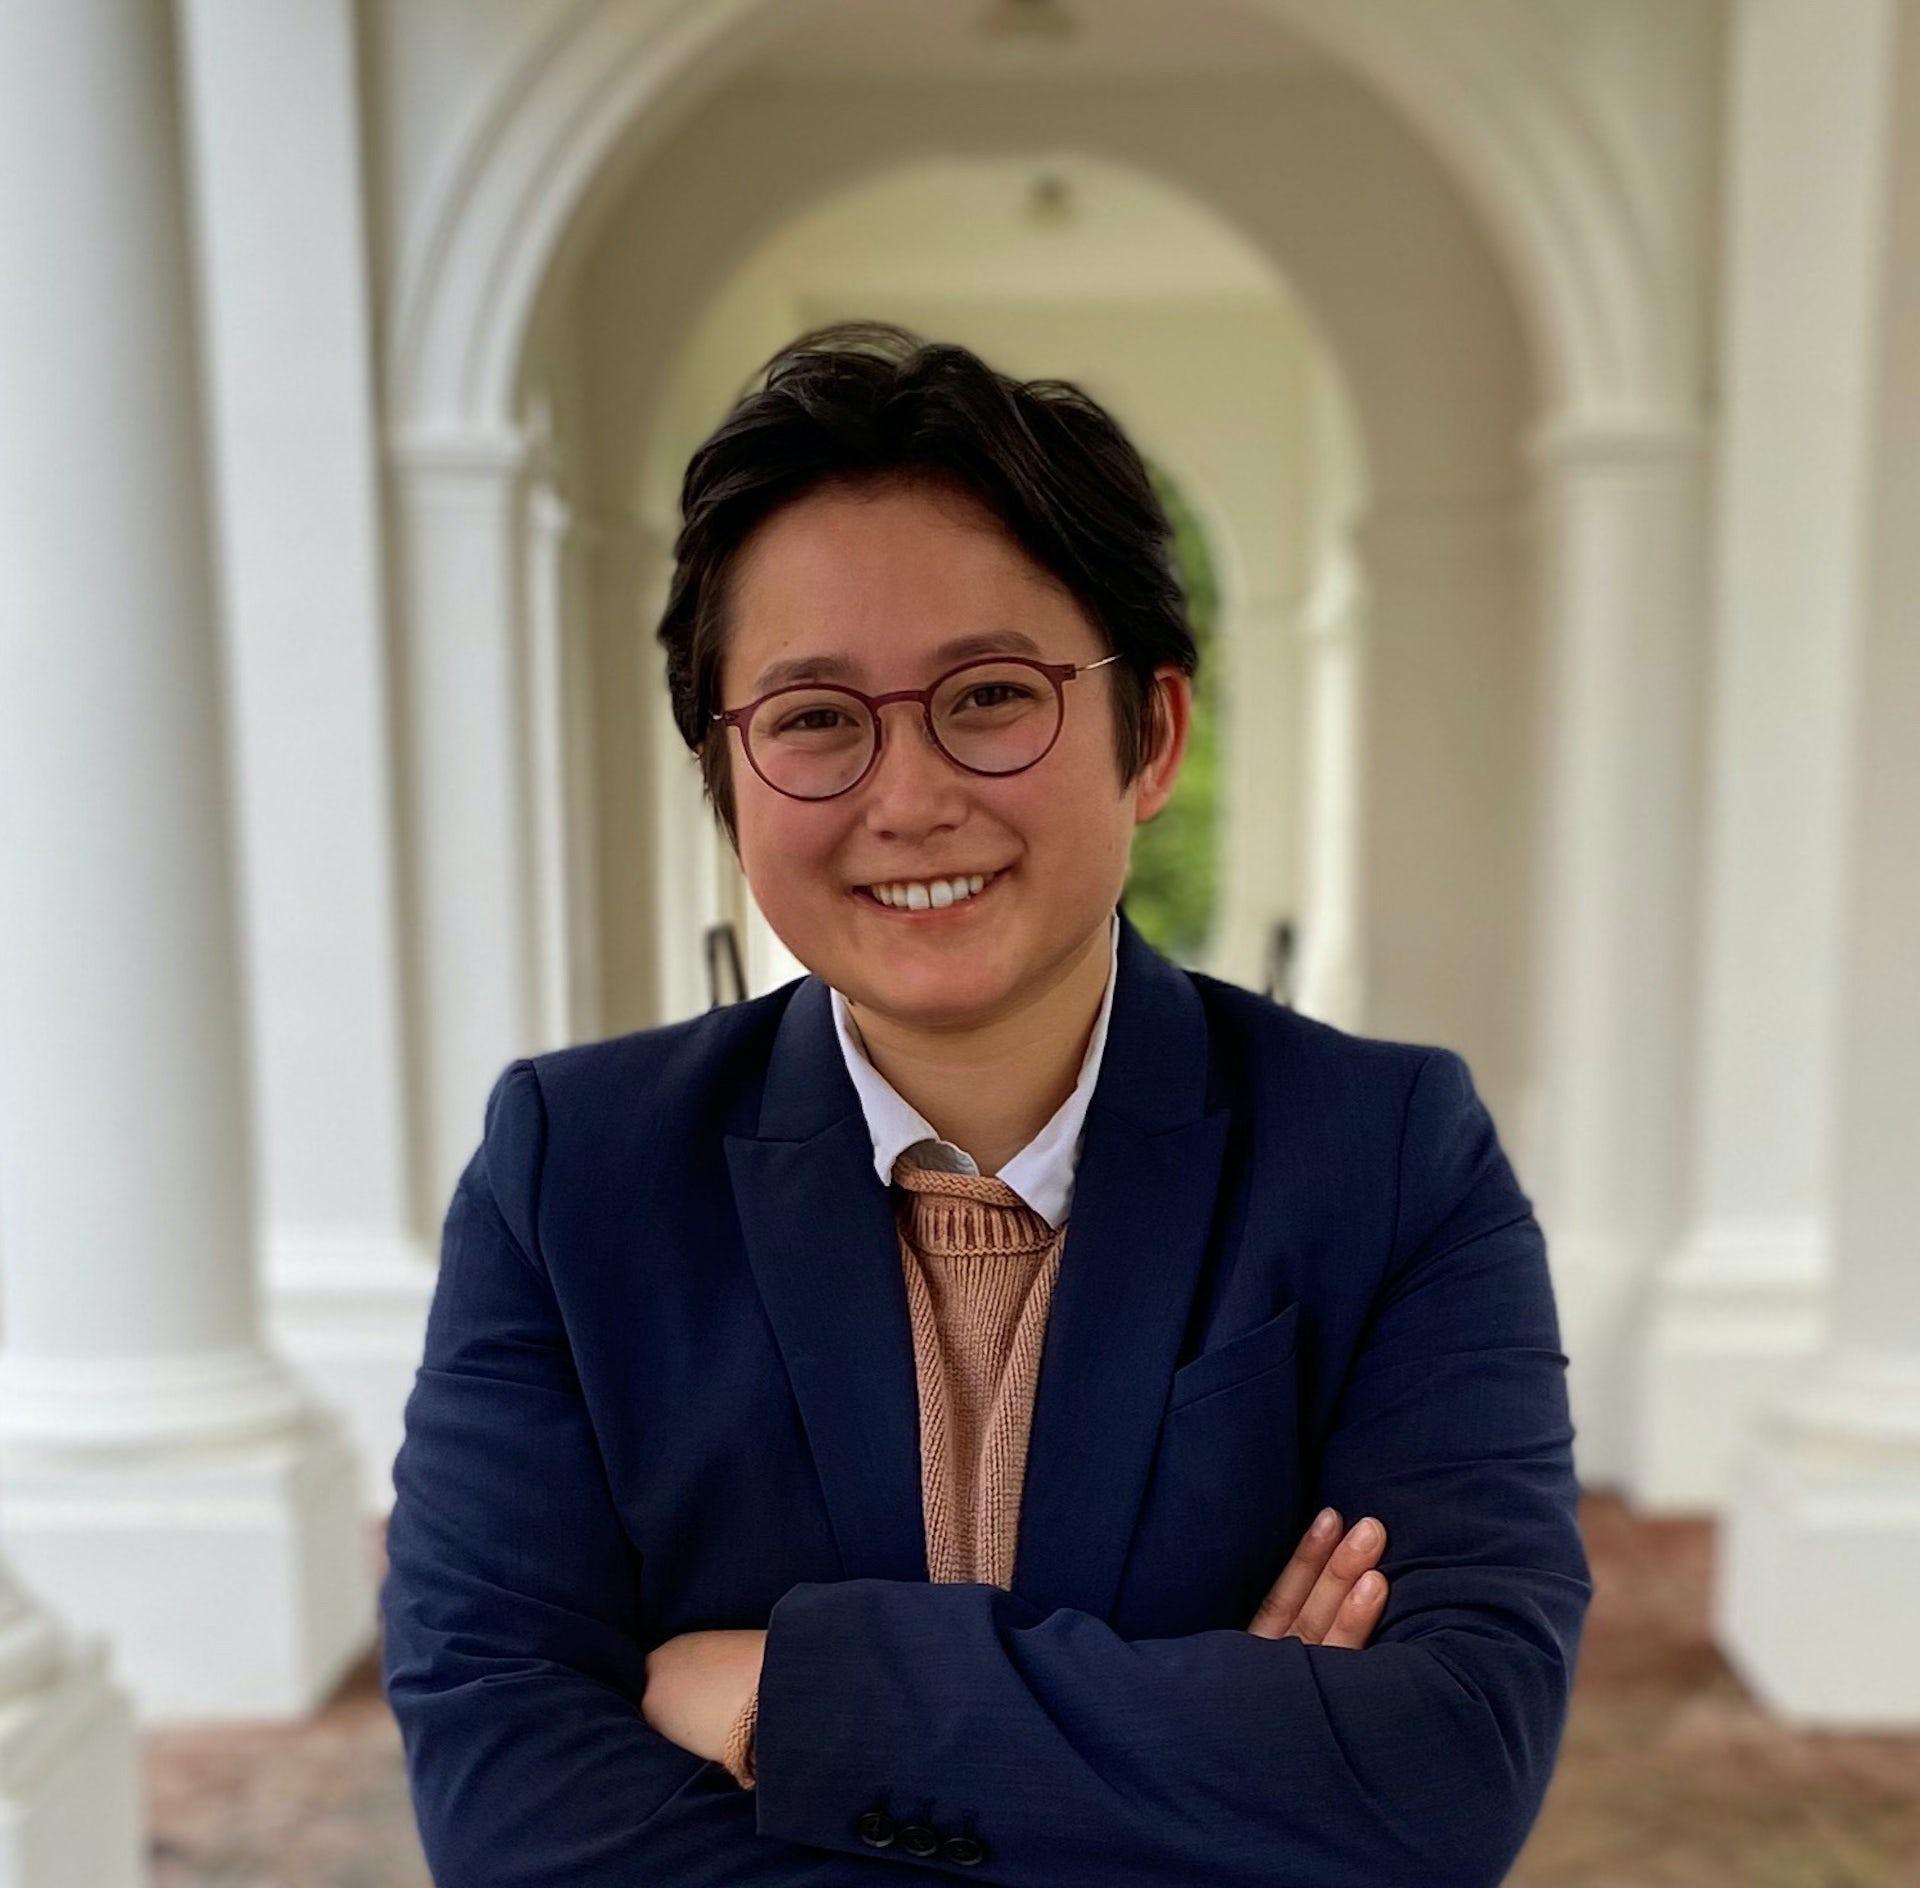 University of Virginia's first transgender student council president, Abel Liu